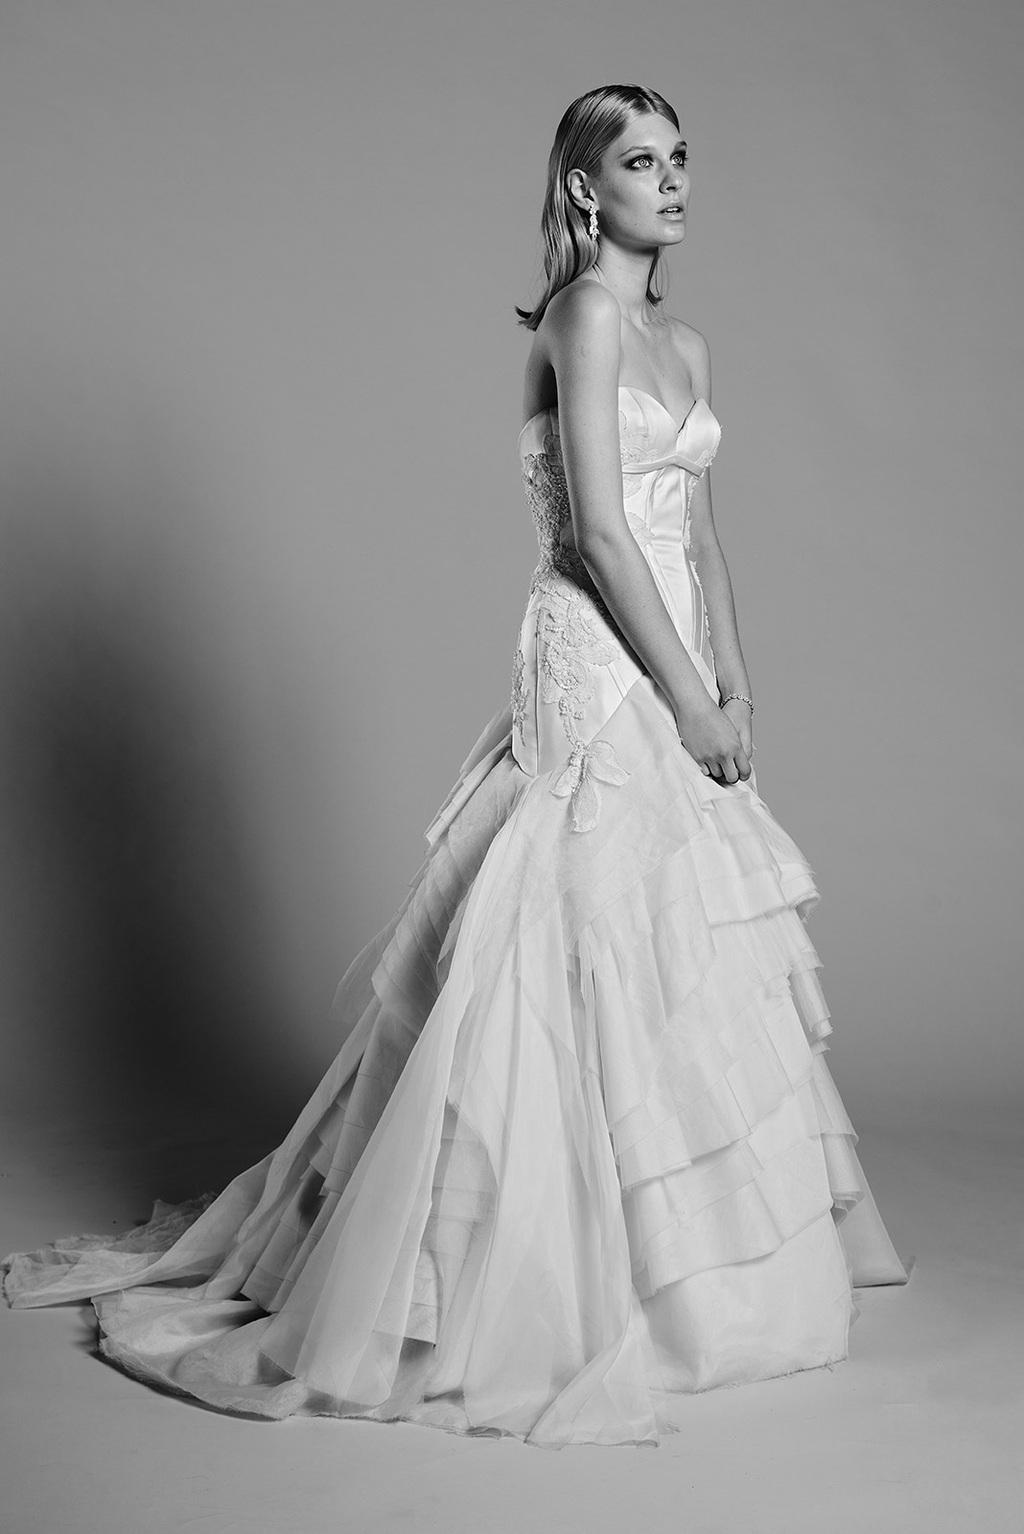 Vienna-wedding-dress-by-mariana-hardwick-2014-bridal.full